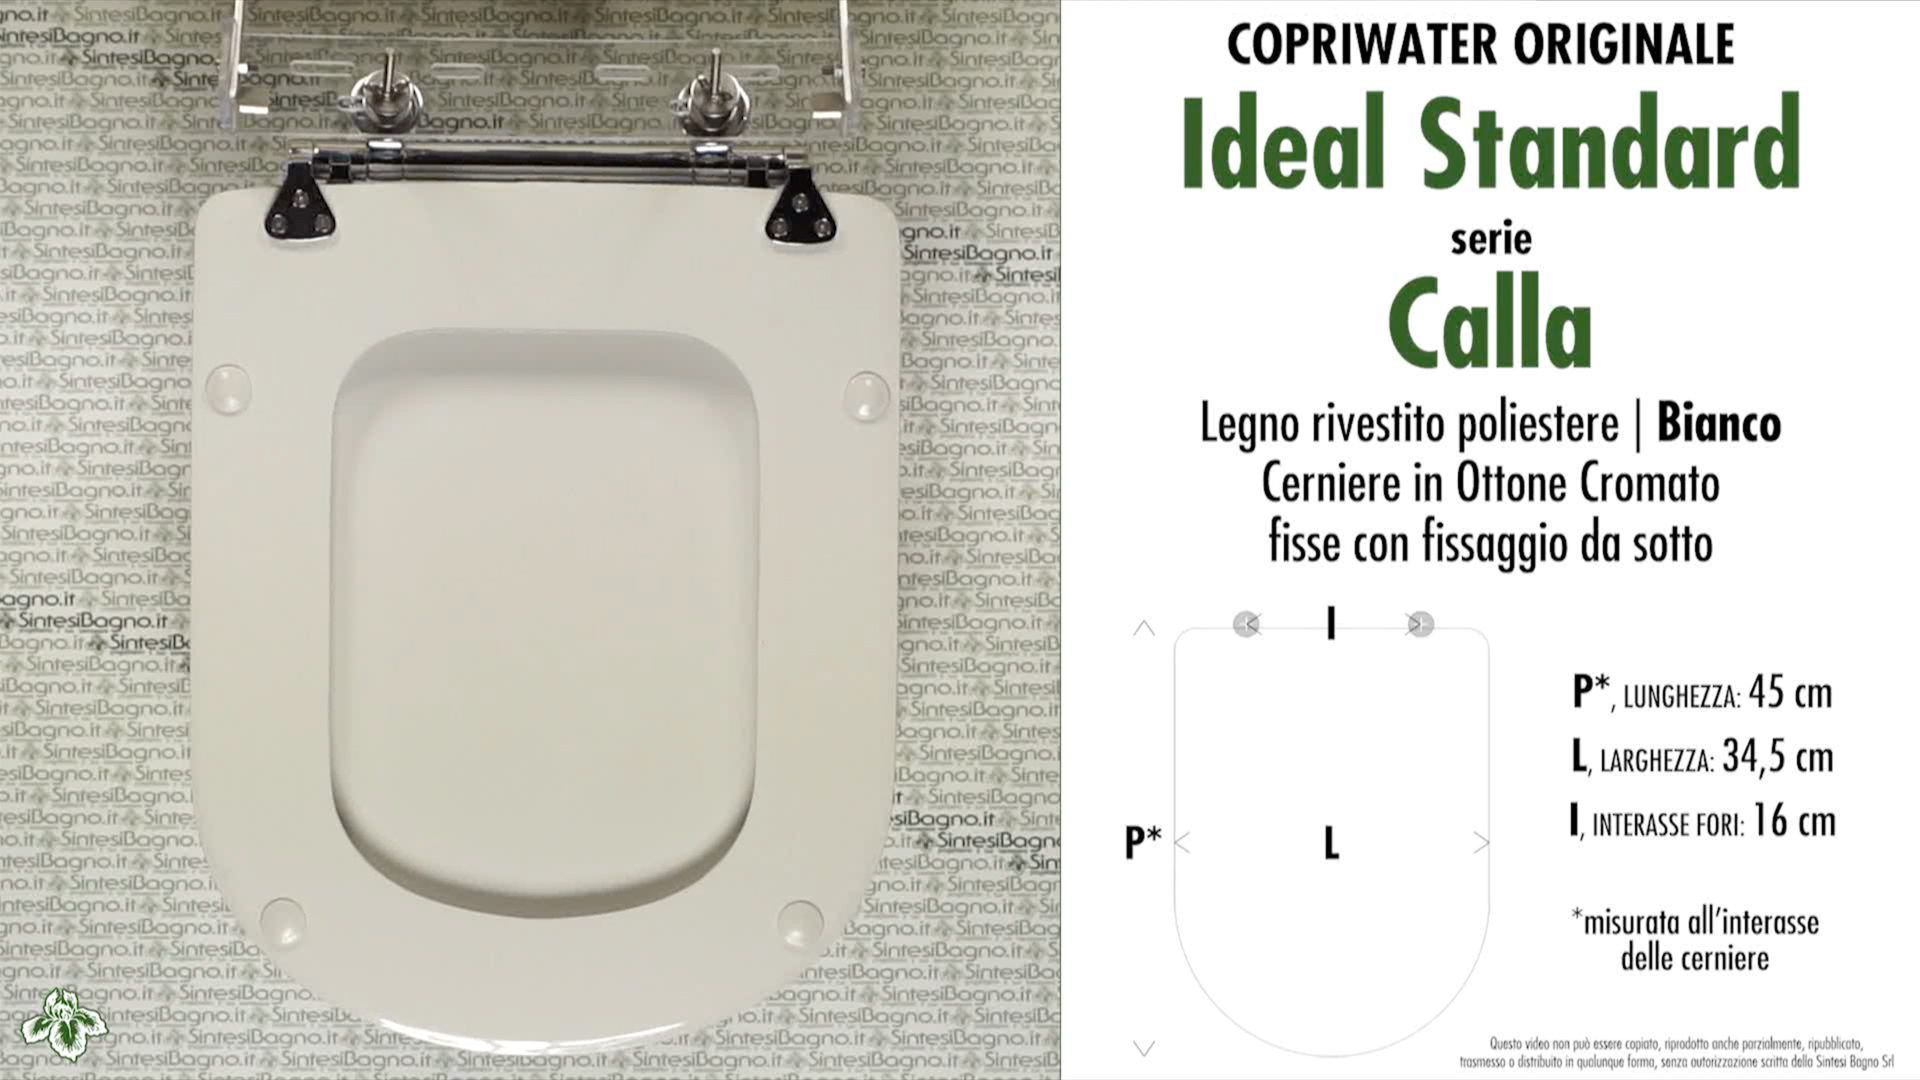 scheda-tecnica-datasheet-copriwater-originale-ideal-standard-serie-calla